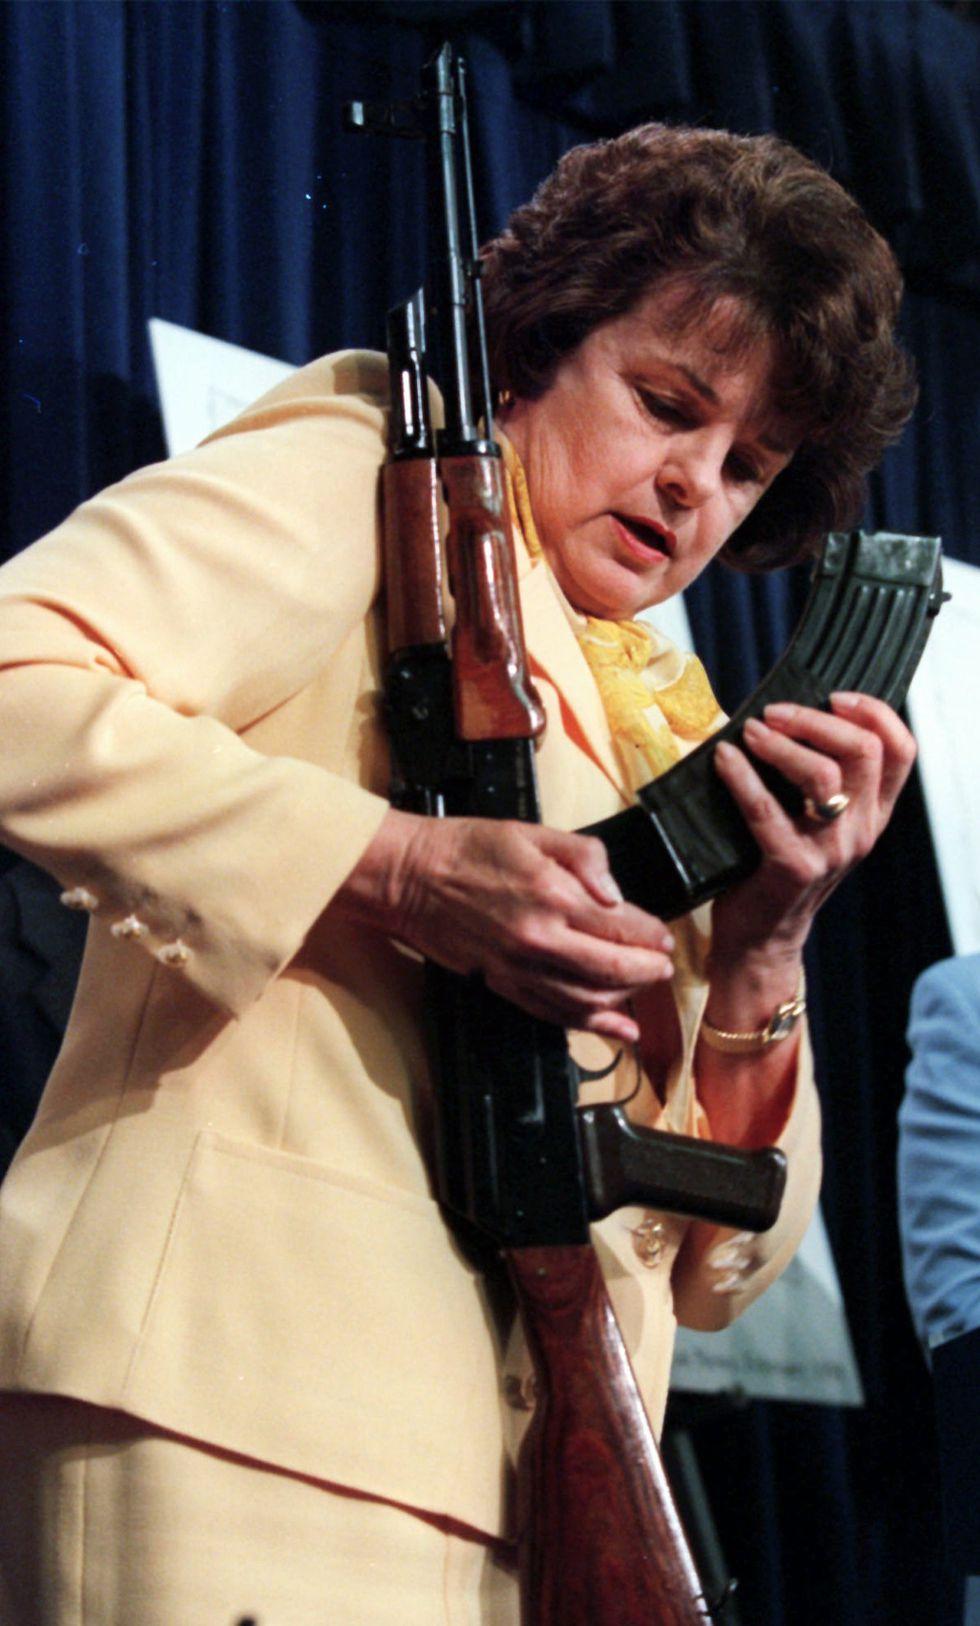 In this March 31, 1998, file photo, Sen. Dianne Feinstein, D-Calif., examines a magazine clip...